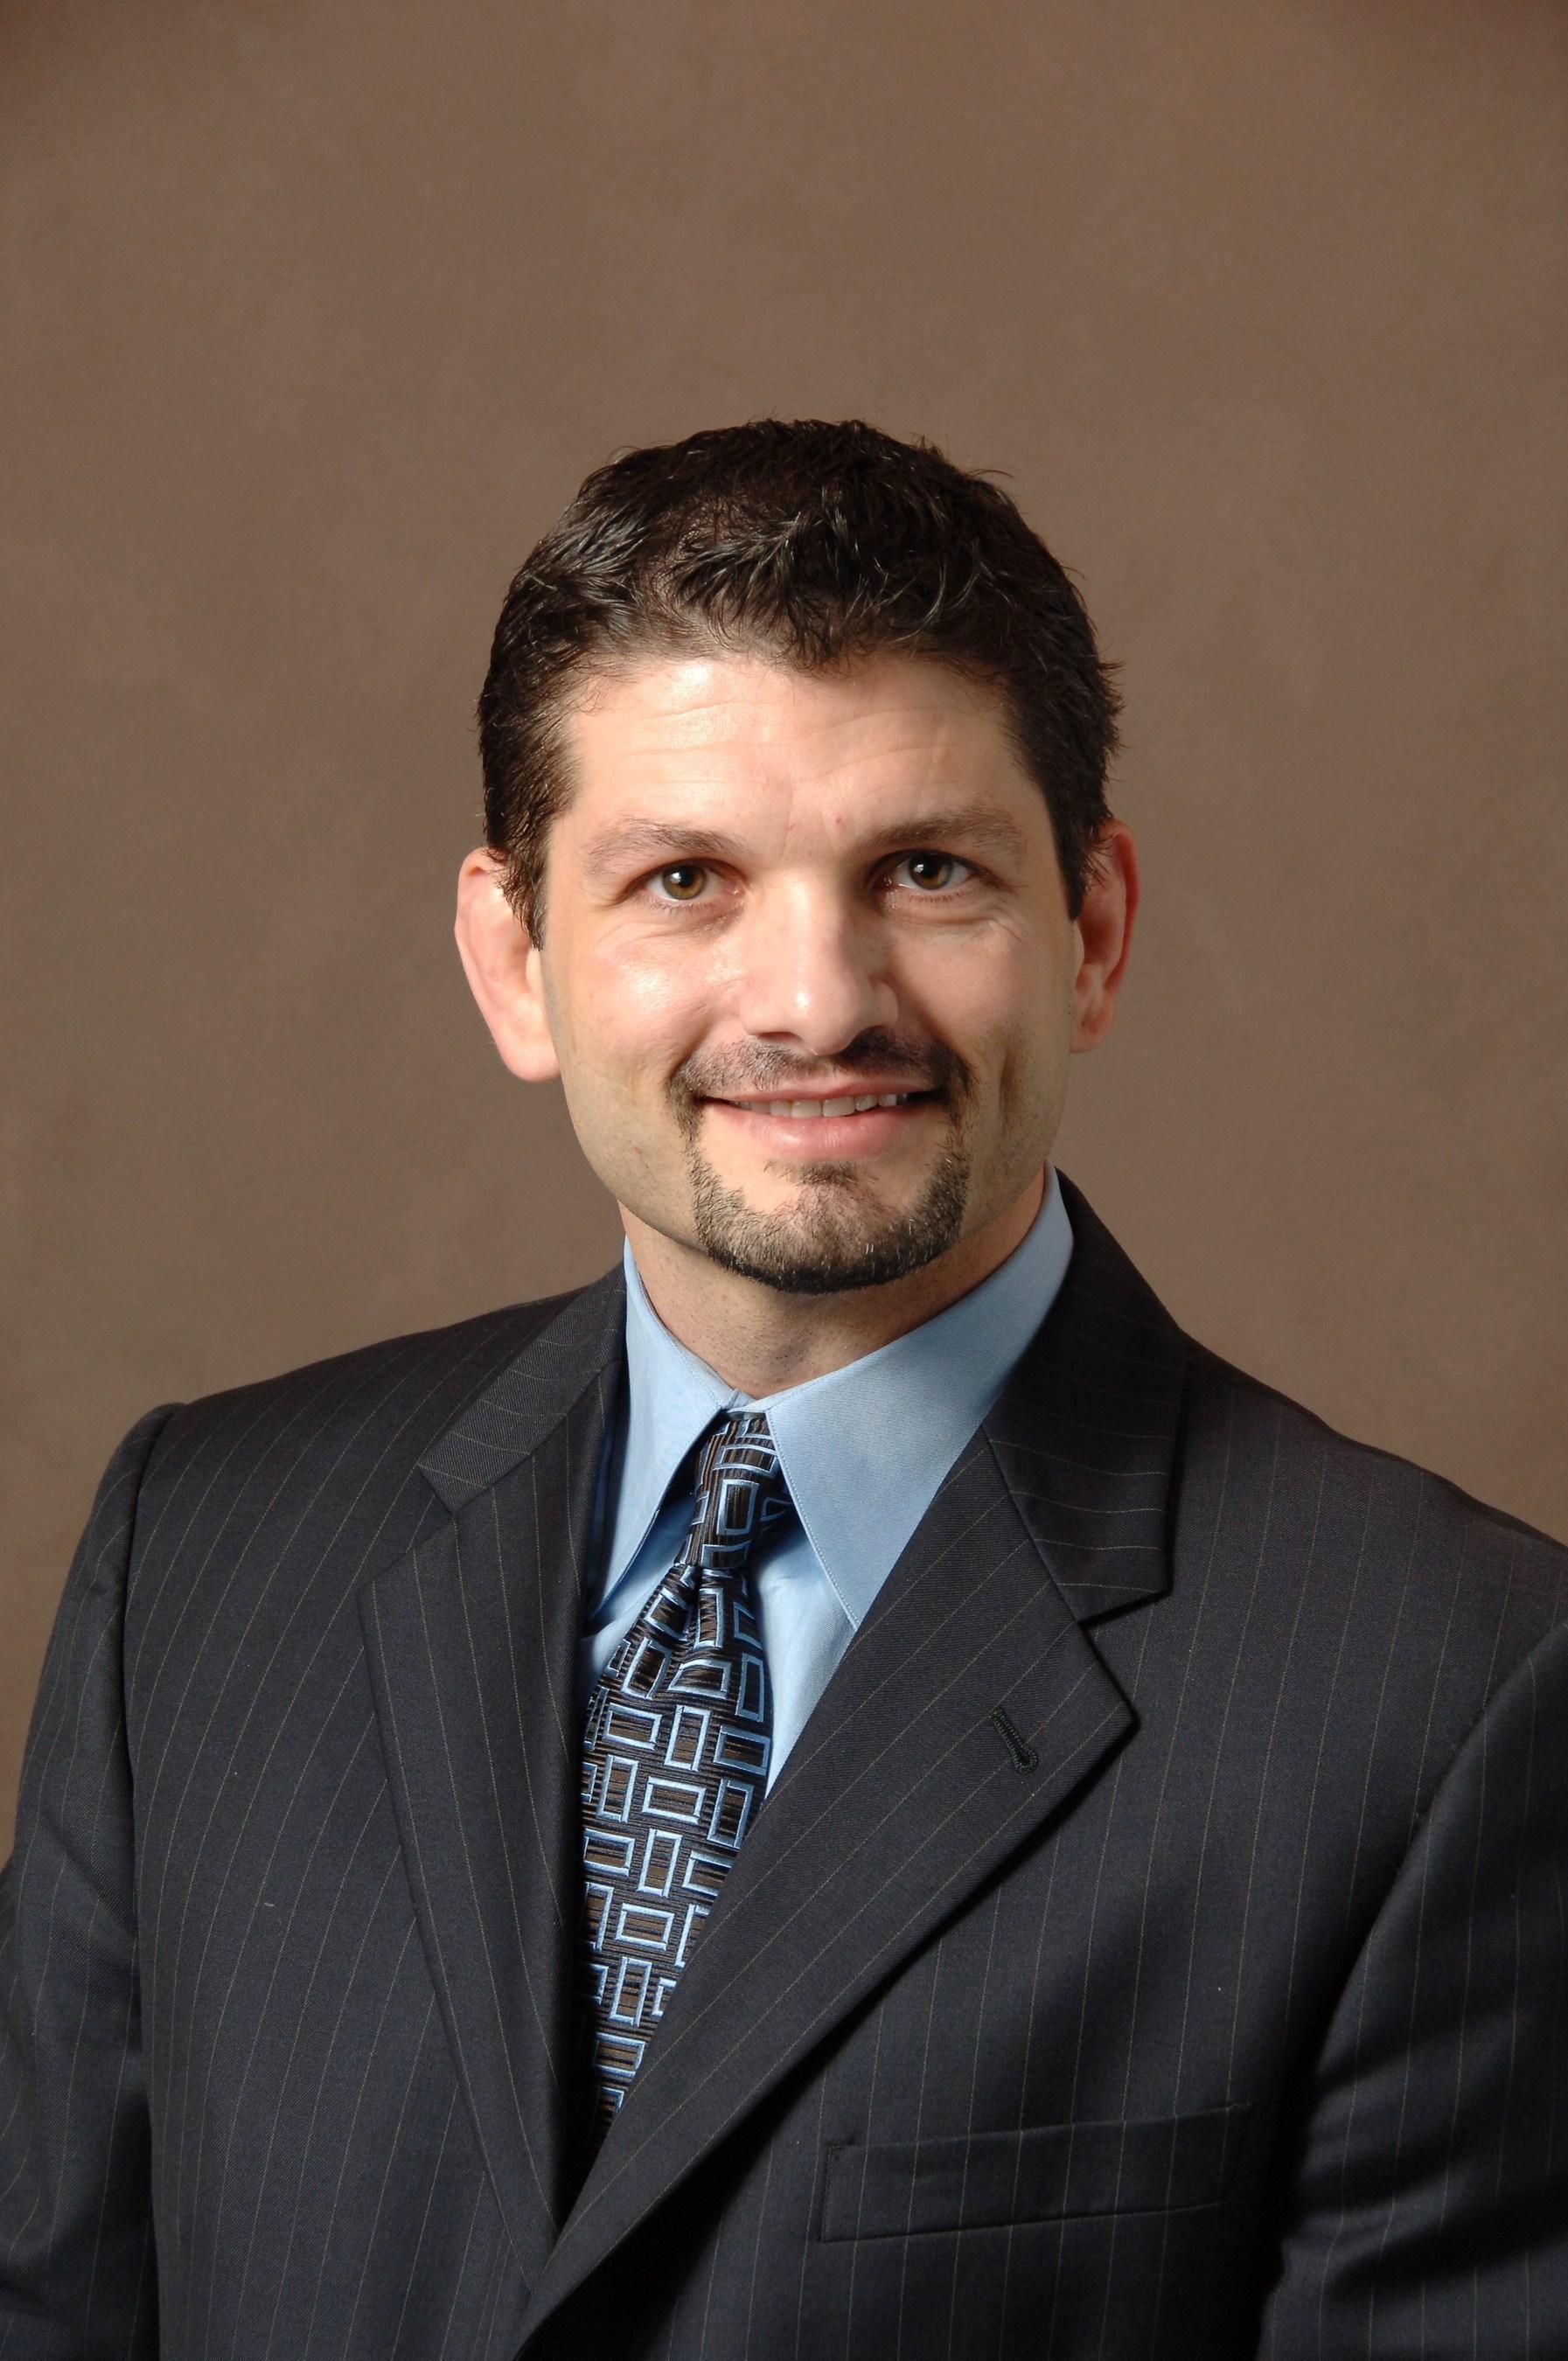 Jim Pearson, President & CEO, NICO Corporation